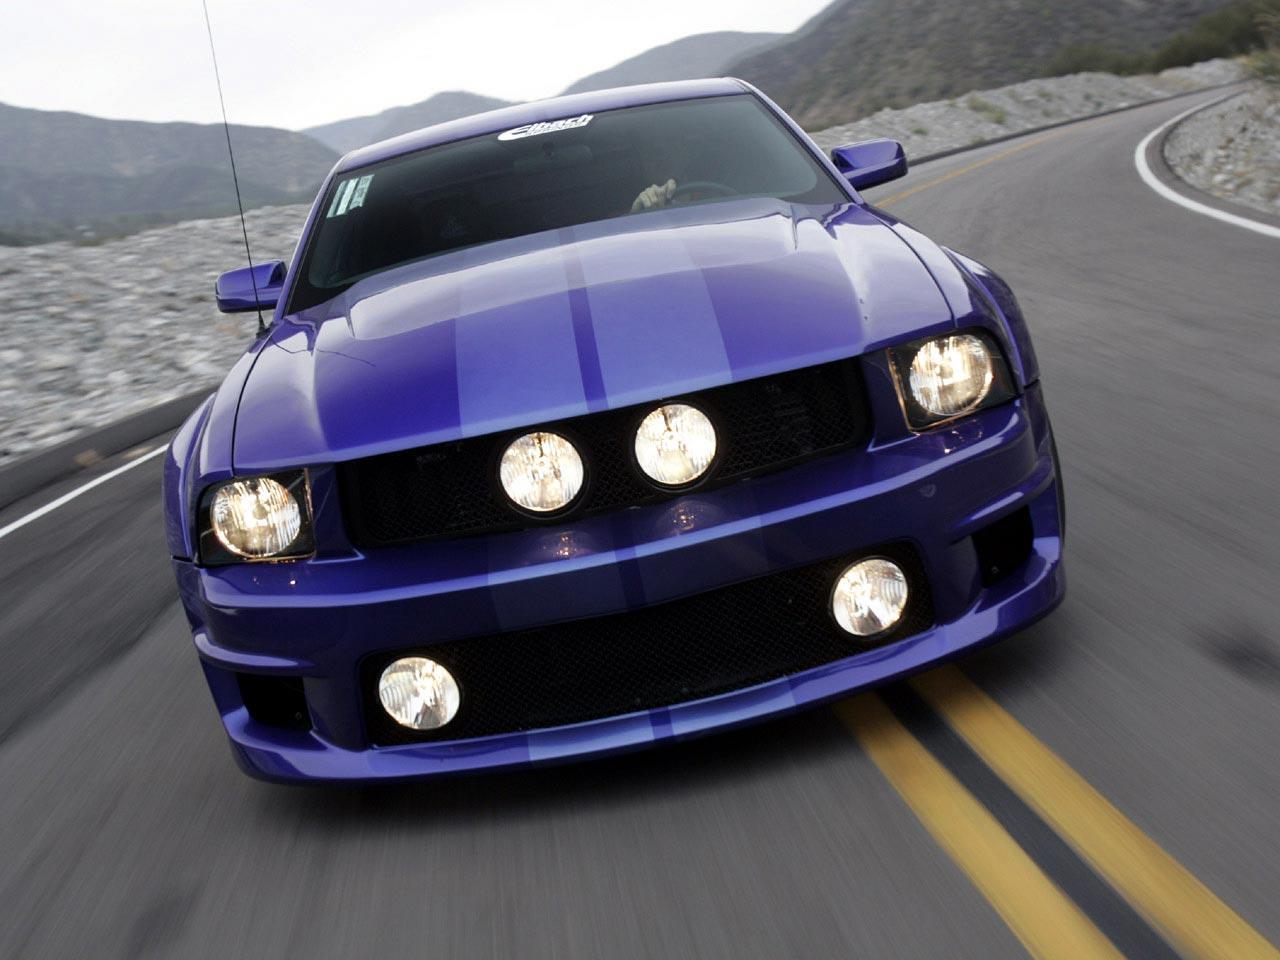 http://3.bp.blogspot.com/-nF_nb-B5M-8/TVWOO7YvAHI/AAAAAAAAAj4/SEkUFFLgg38/s1600/imagem-carros-mustang.jpg